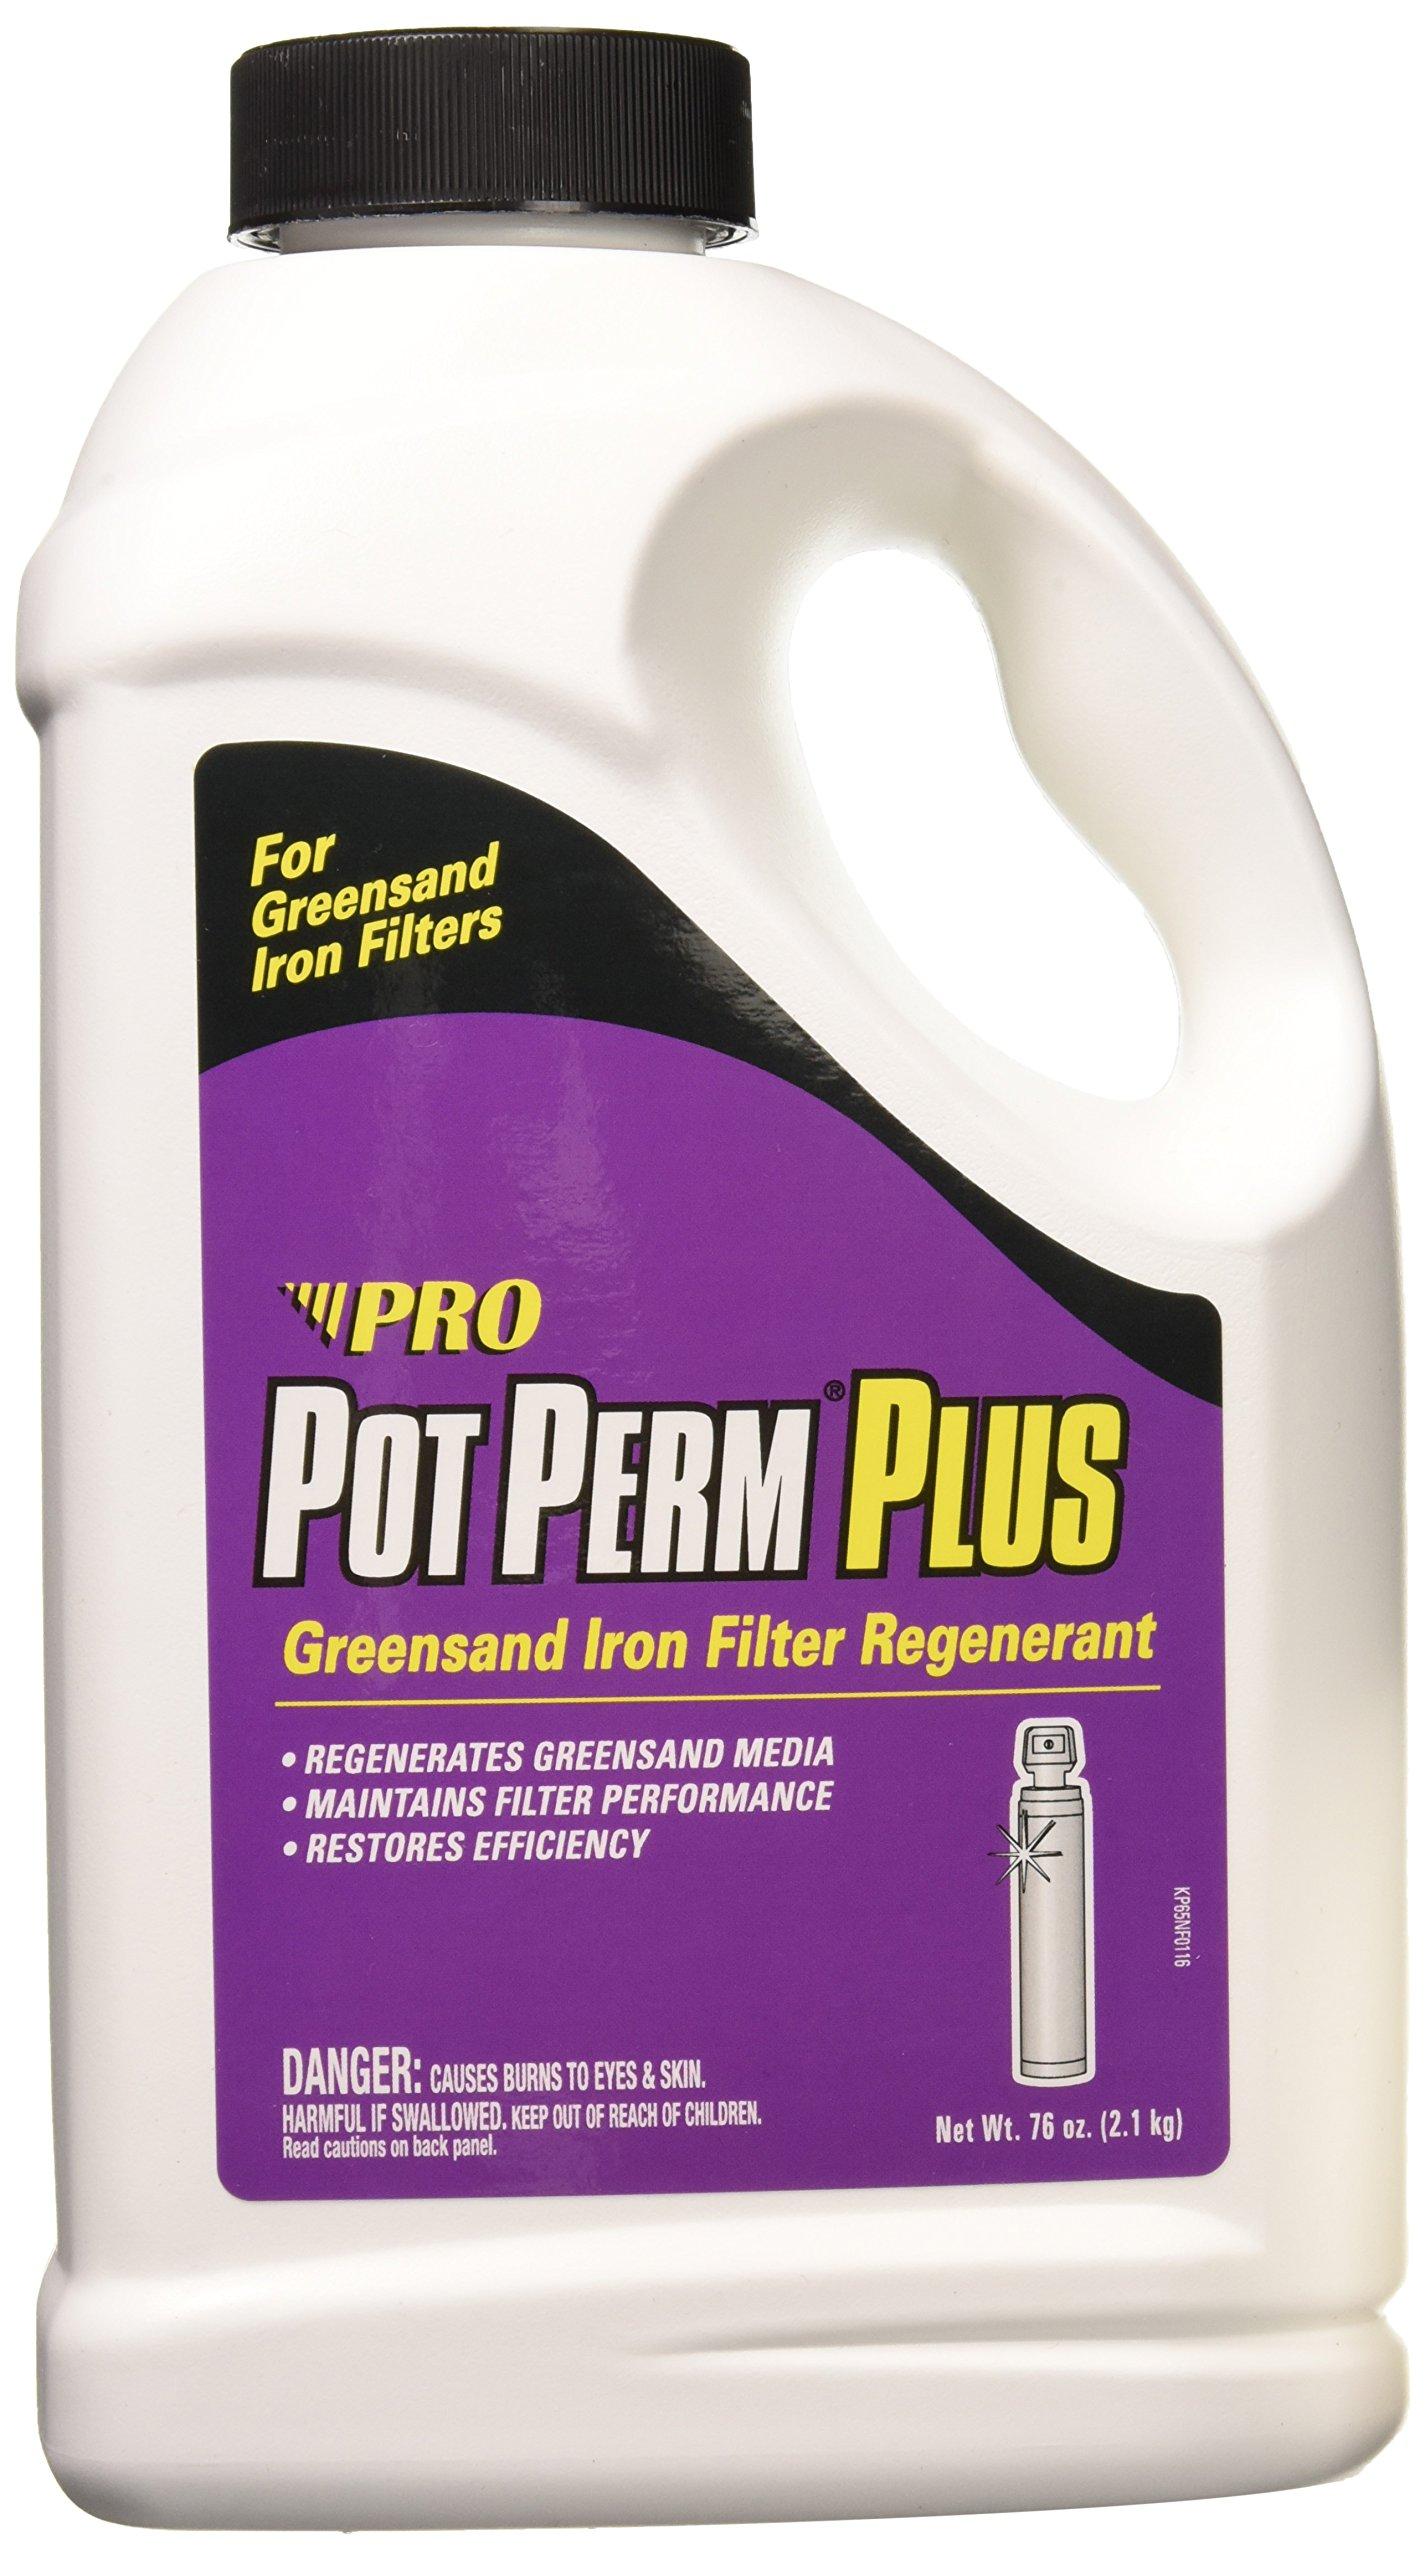 Pot Perm Plus Potassium Permanganate Greensand Iron Filter Regenerant 76 Ounce Bottle by Pro Products